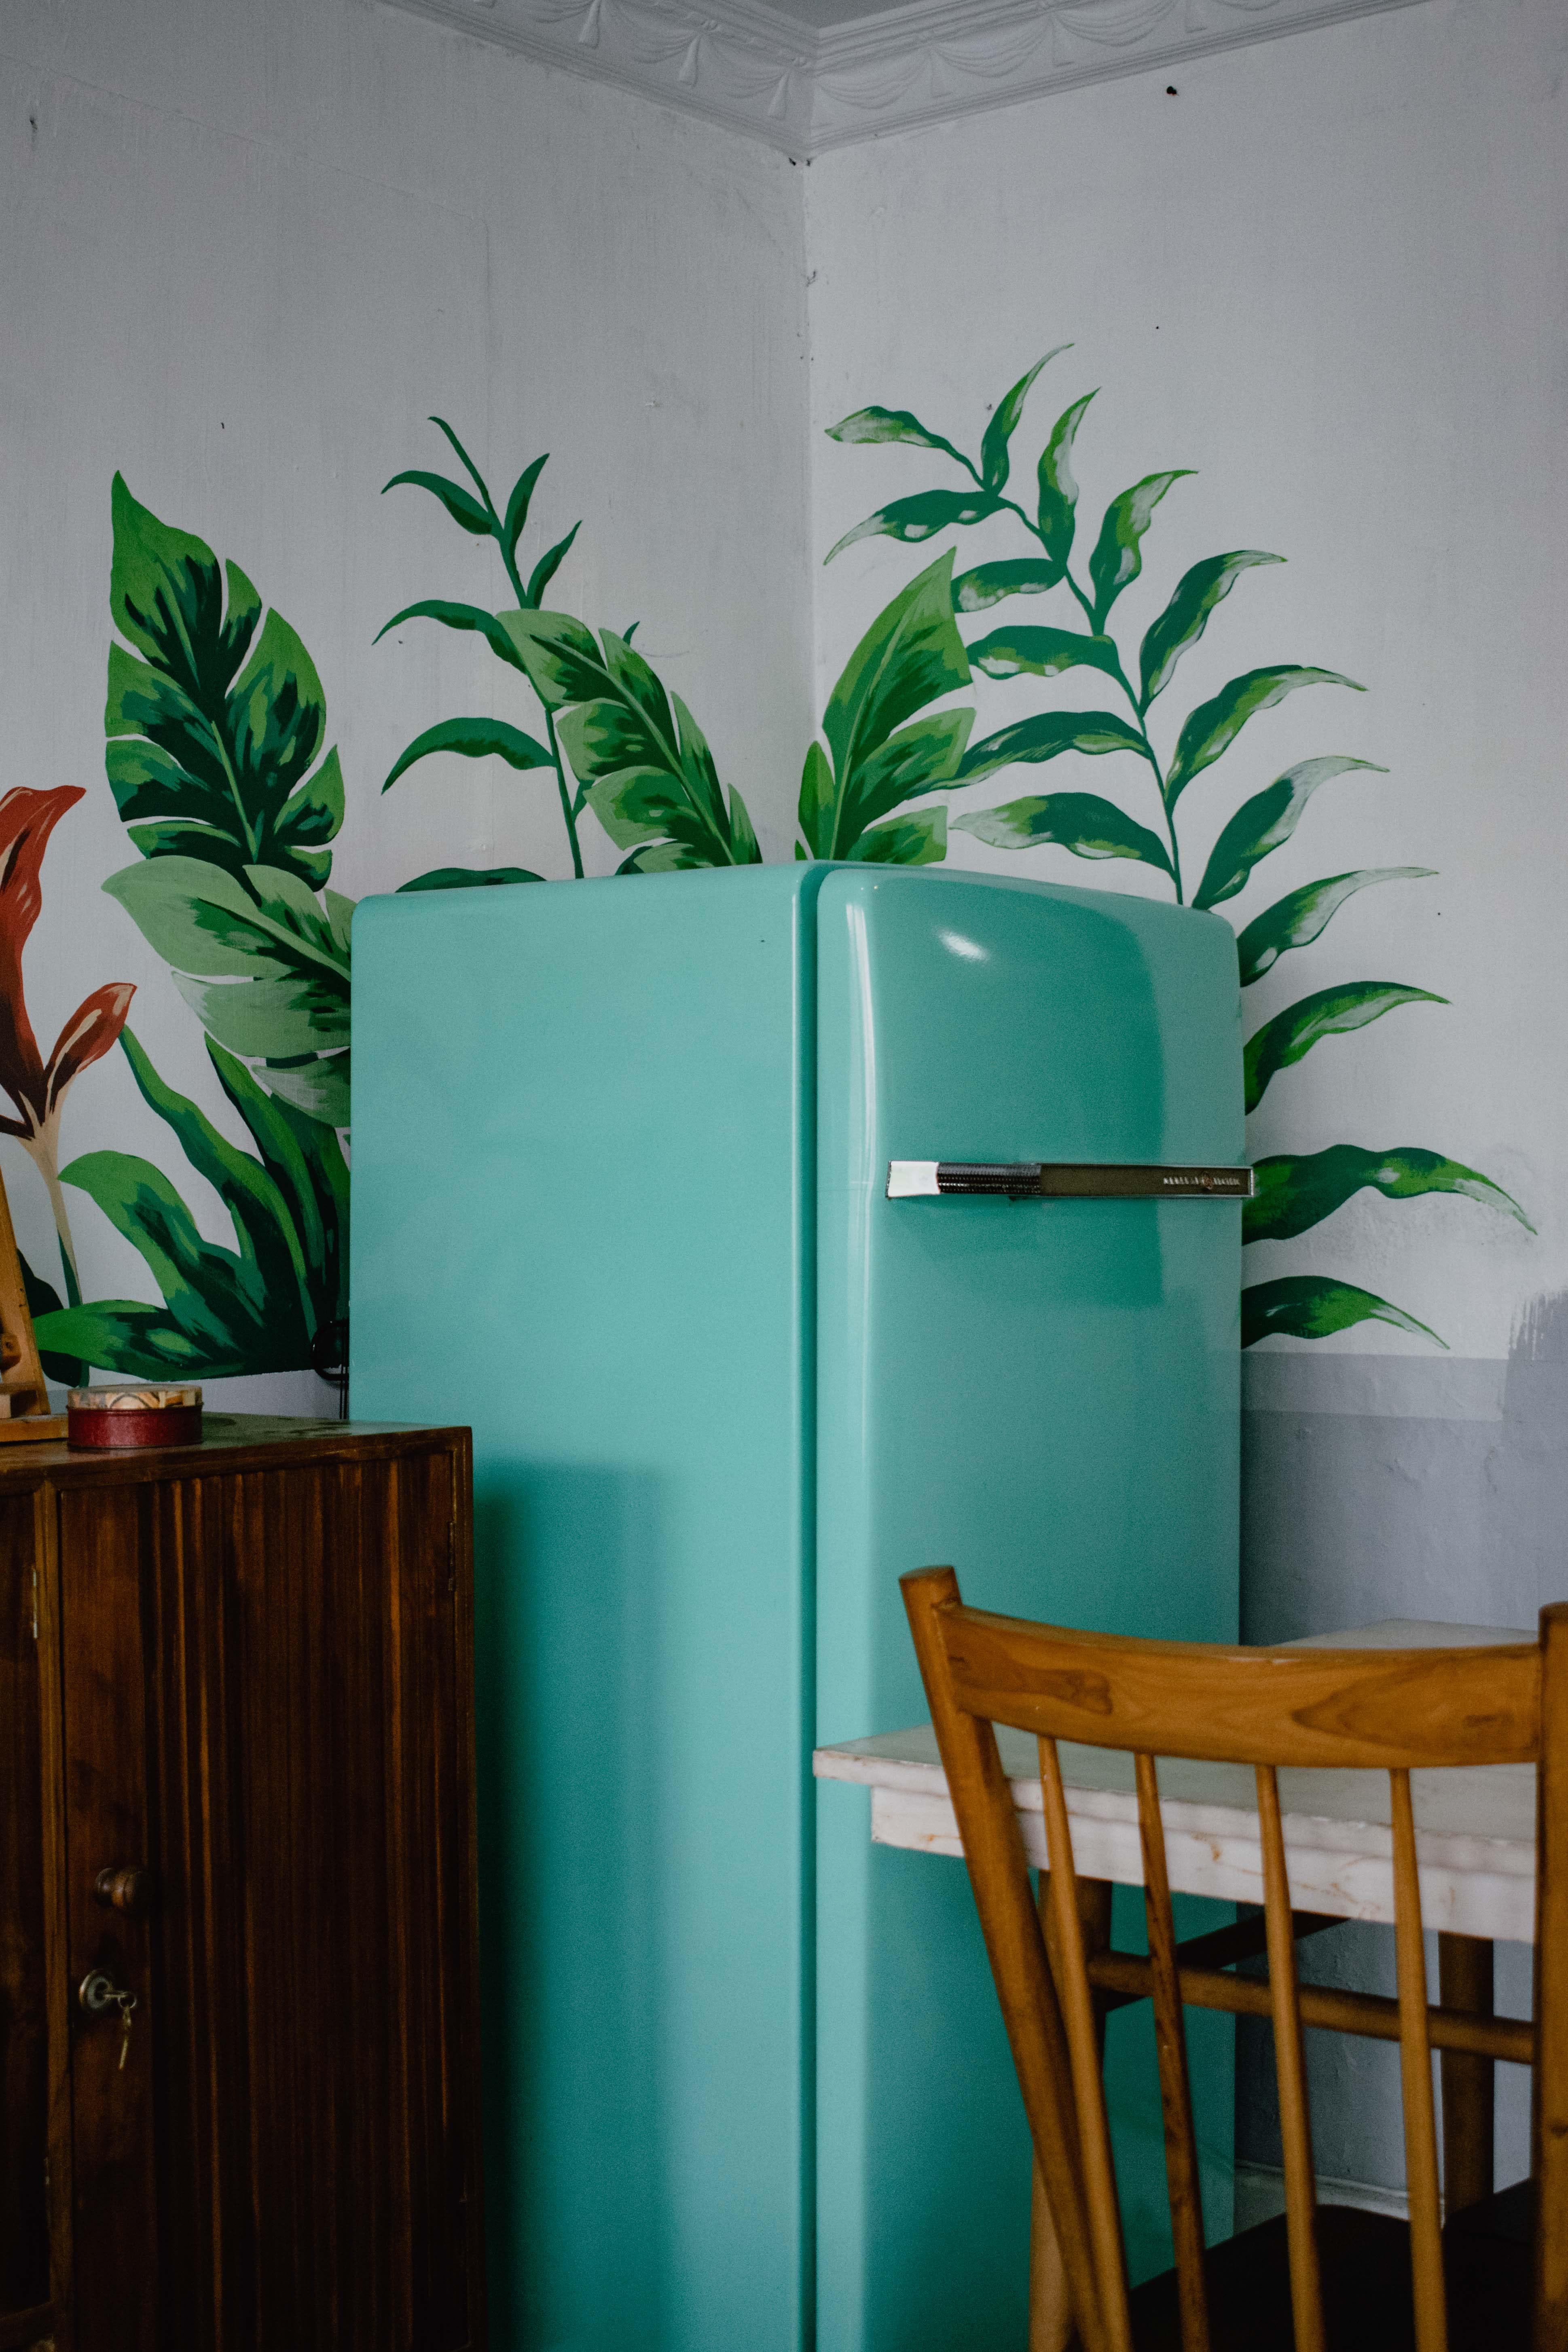 blue refrigerator beside green-leafed plant